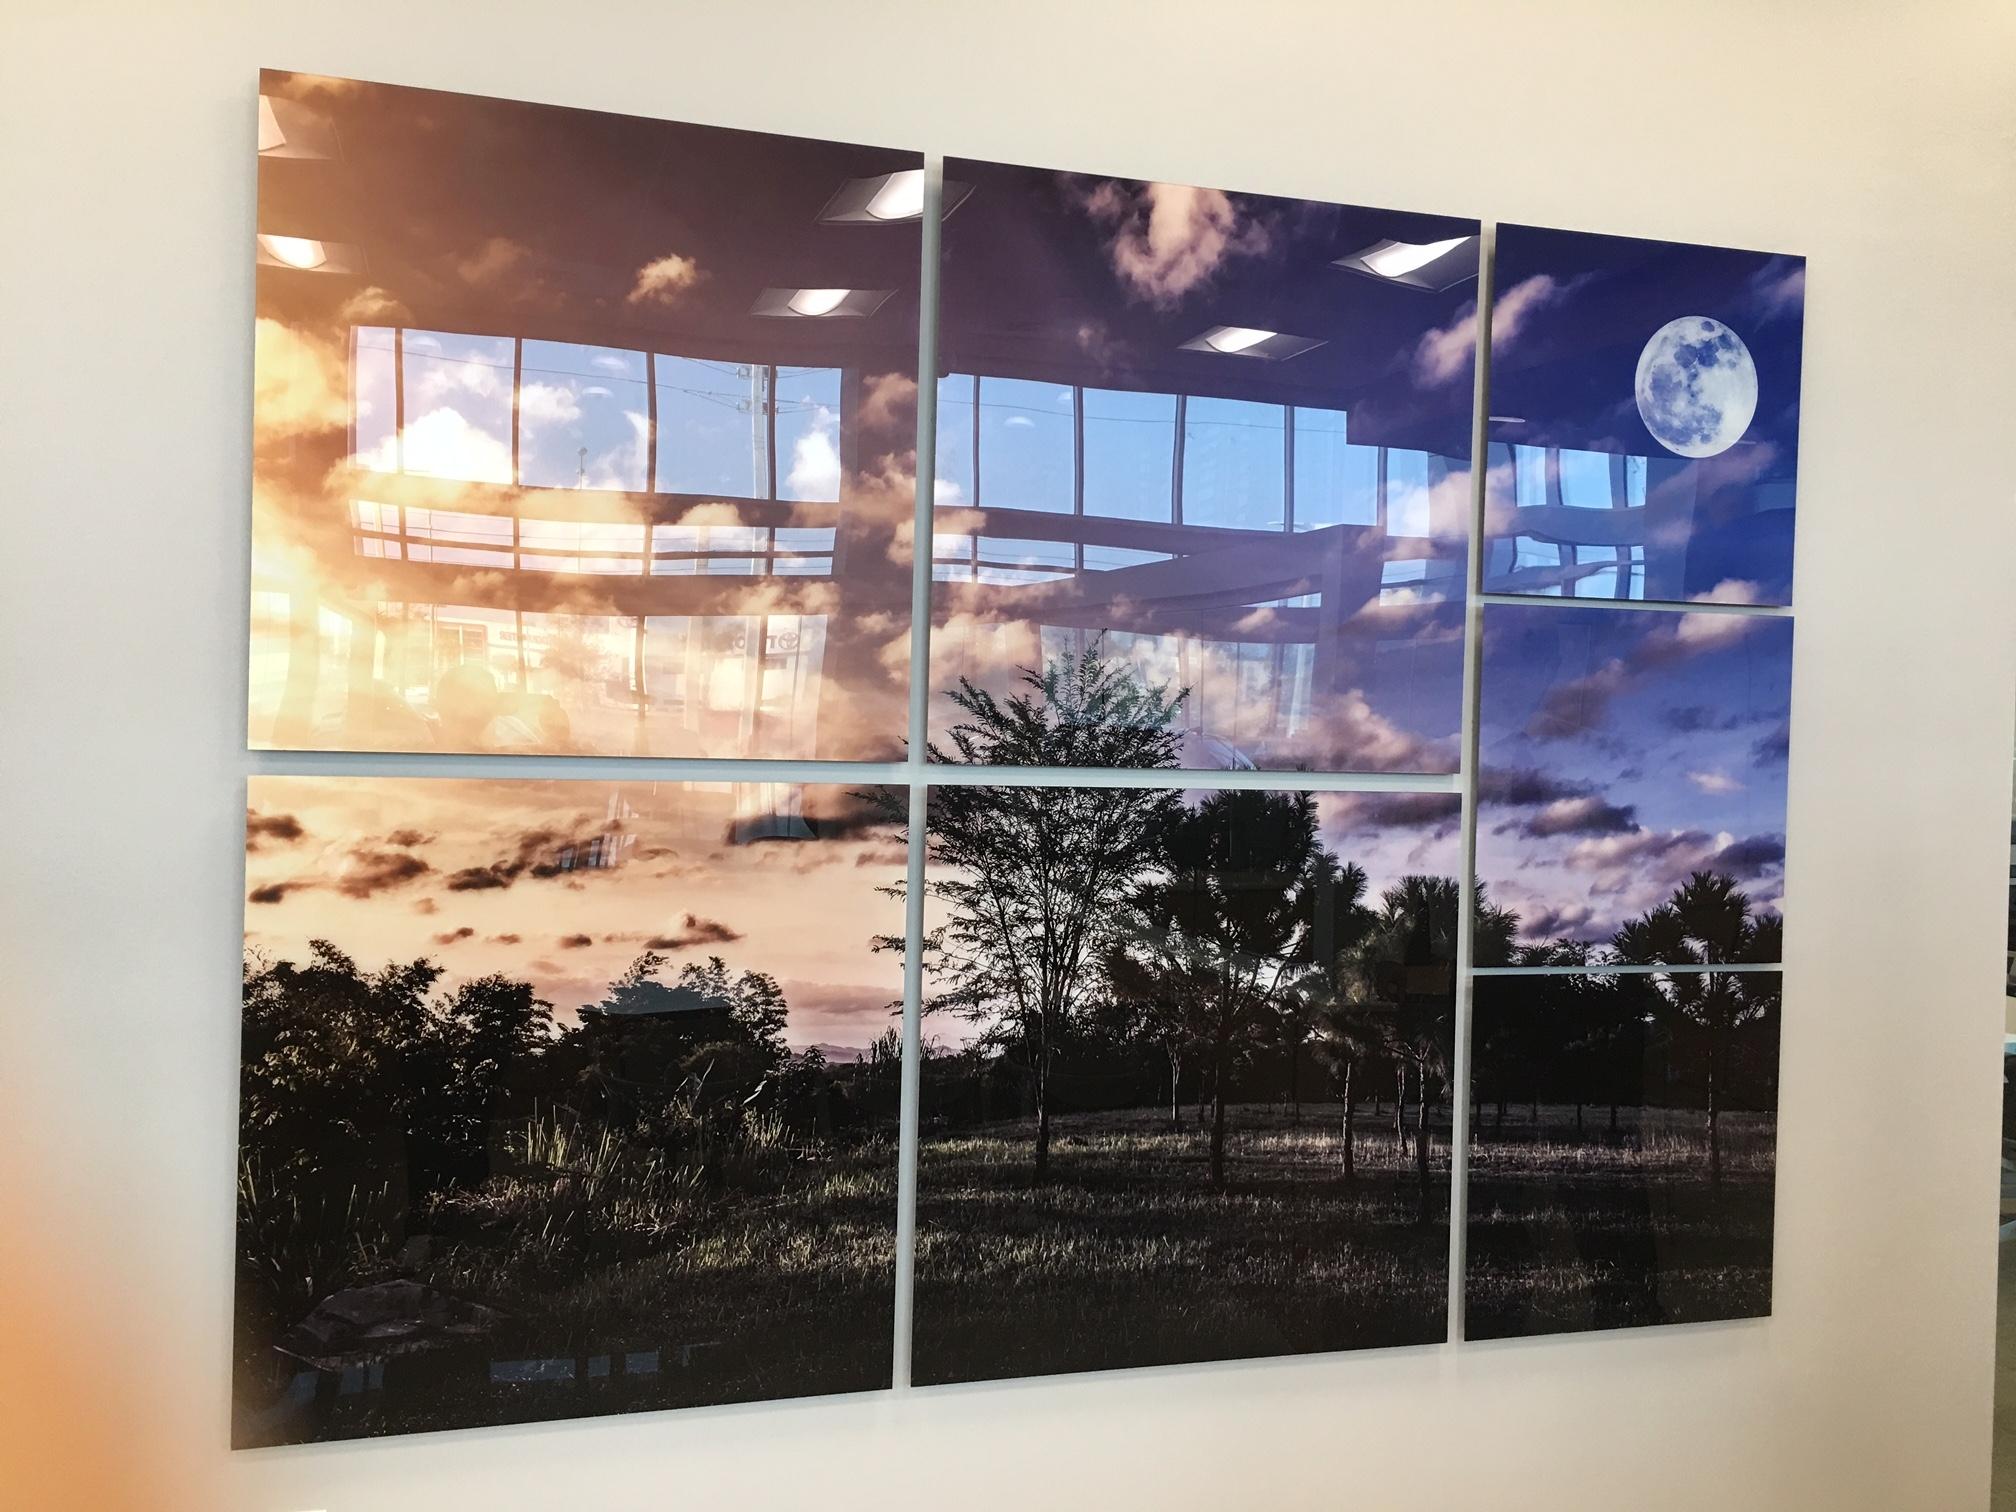 Acrylic Wall Art | Glass Photo Prints | Custom Acrylic Prints | Big Pertaining To Most Recent Acrylic Wall Art (View 9 of 20)